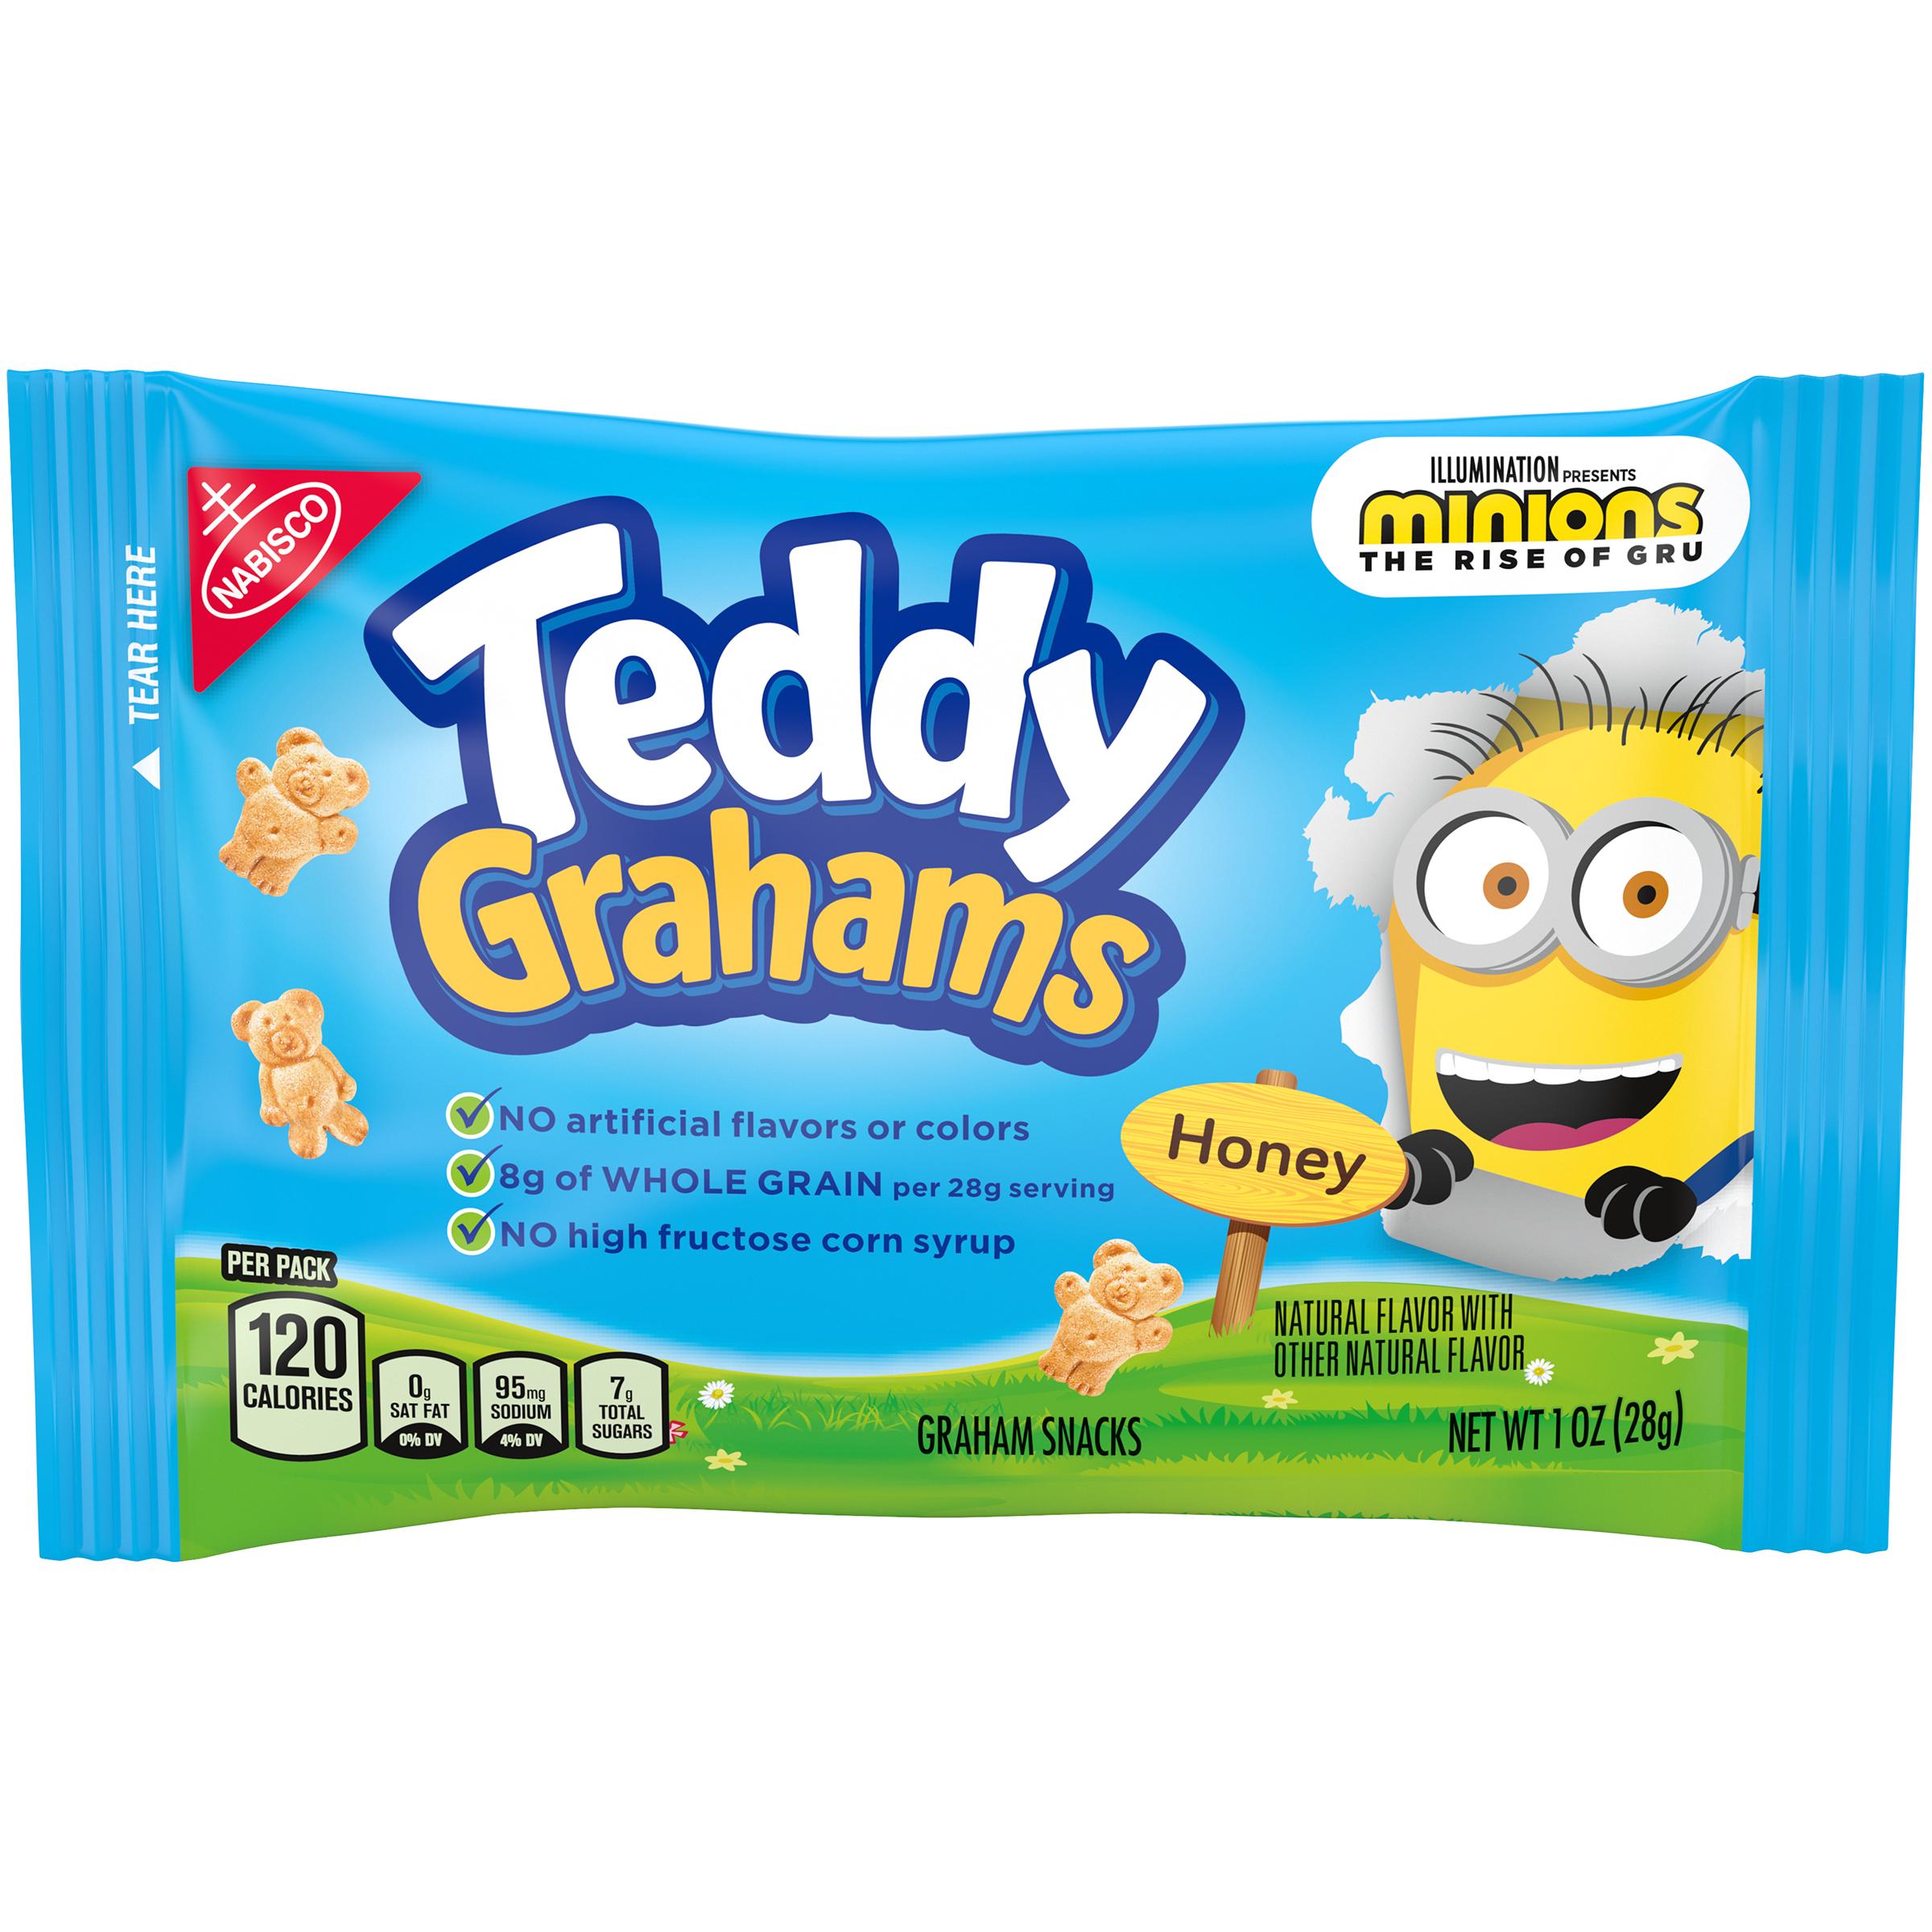 TEDDY GRAHAMS Cookies Biscuit 1 oz